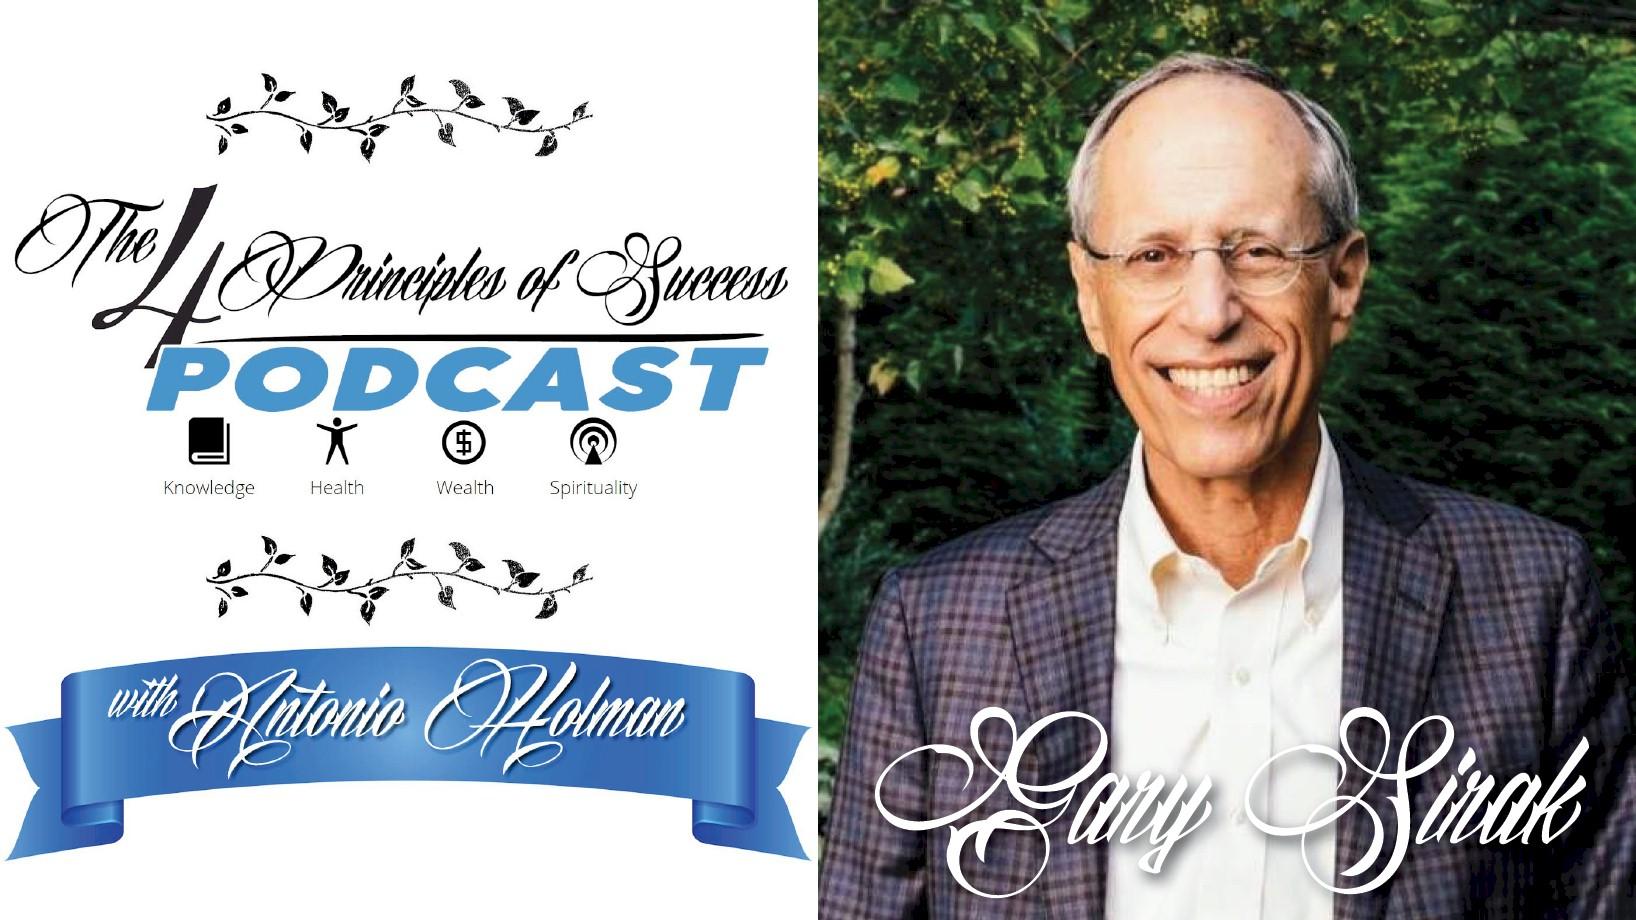 The 4 Principles of Success with Antonio Holman featuring Gary Sirak